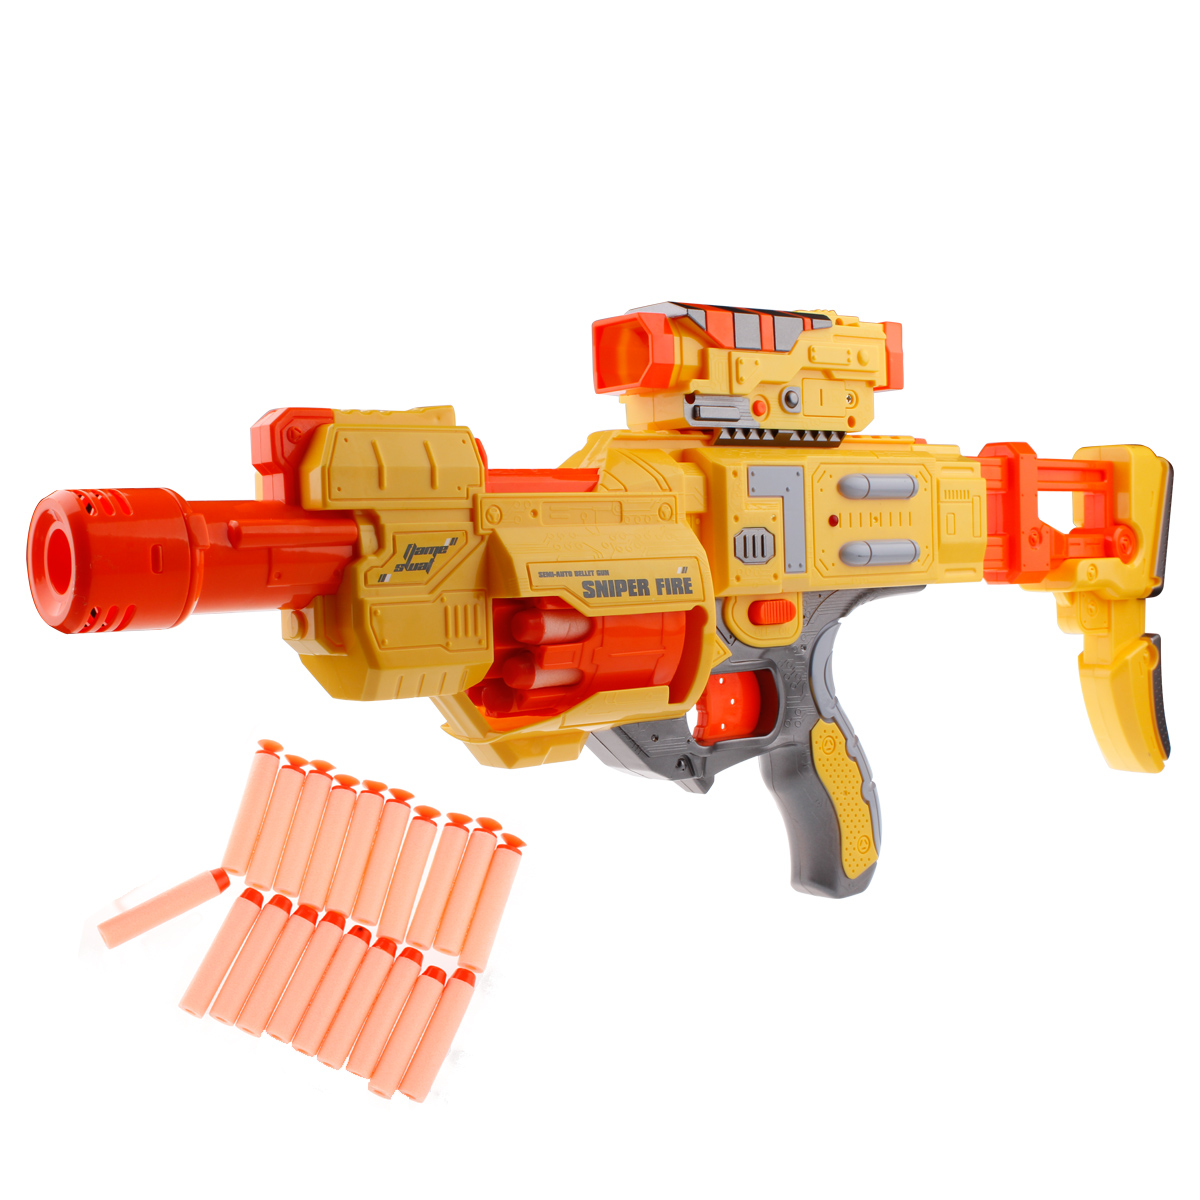 Детский пистолет Revitalization Star джинсы мужские g star raw 604046 gs g star arc